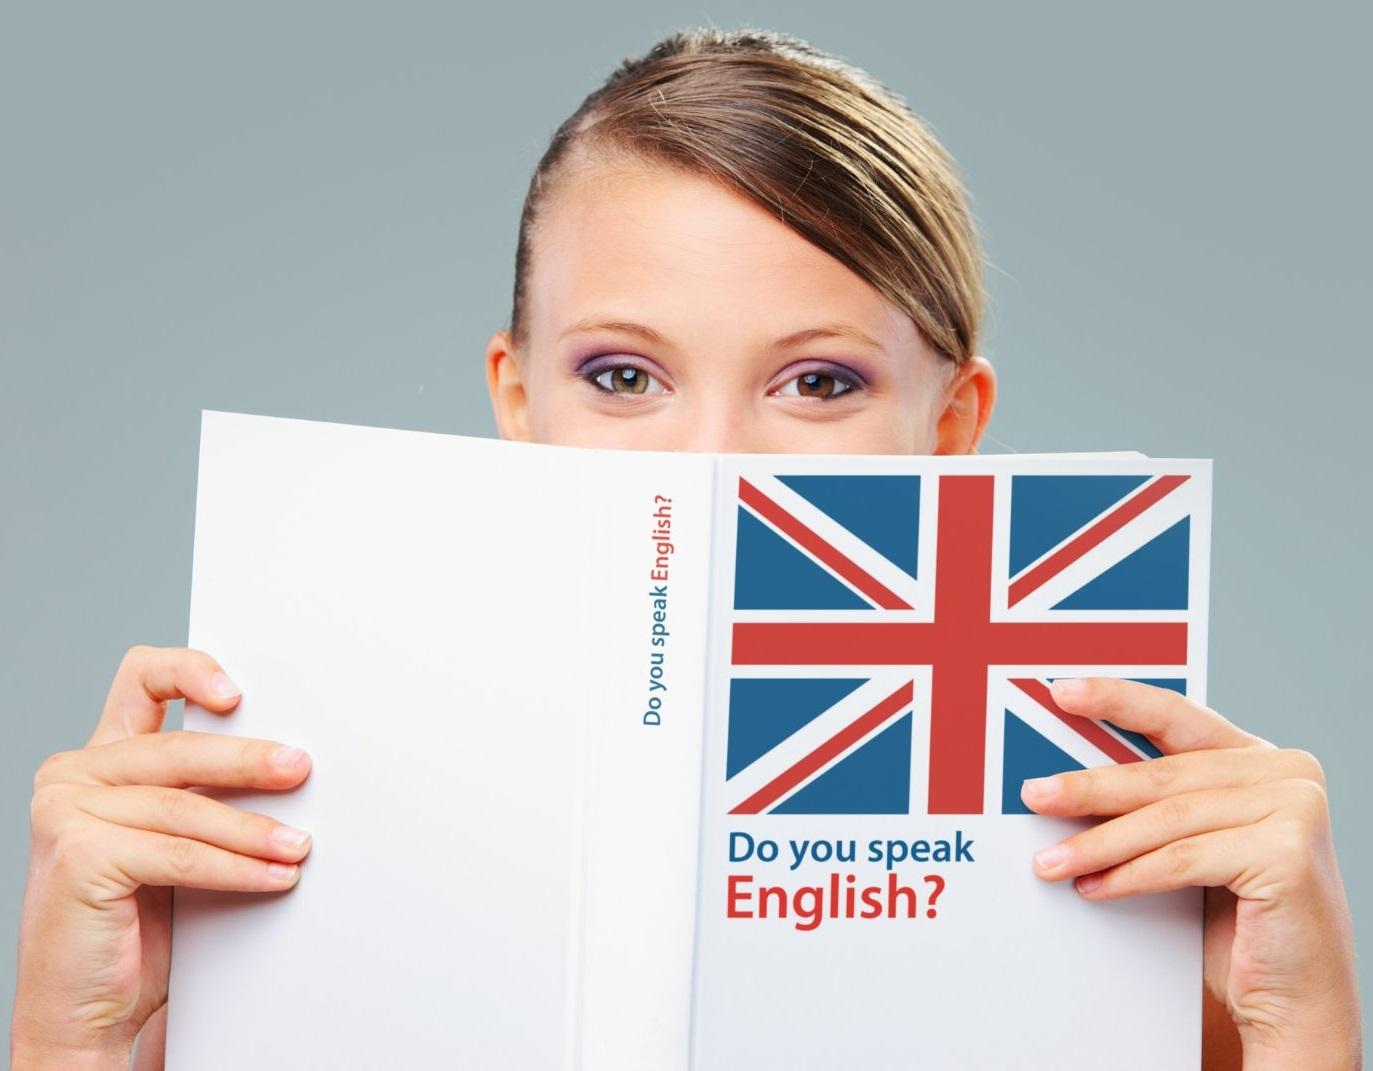 Хочу учить английский картинки